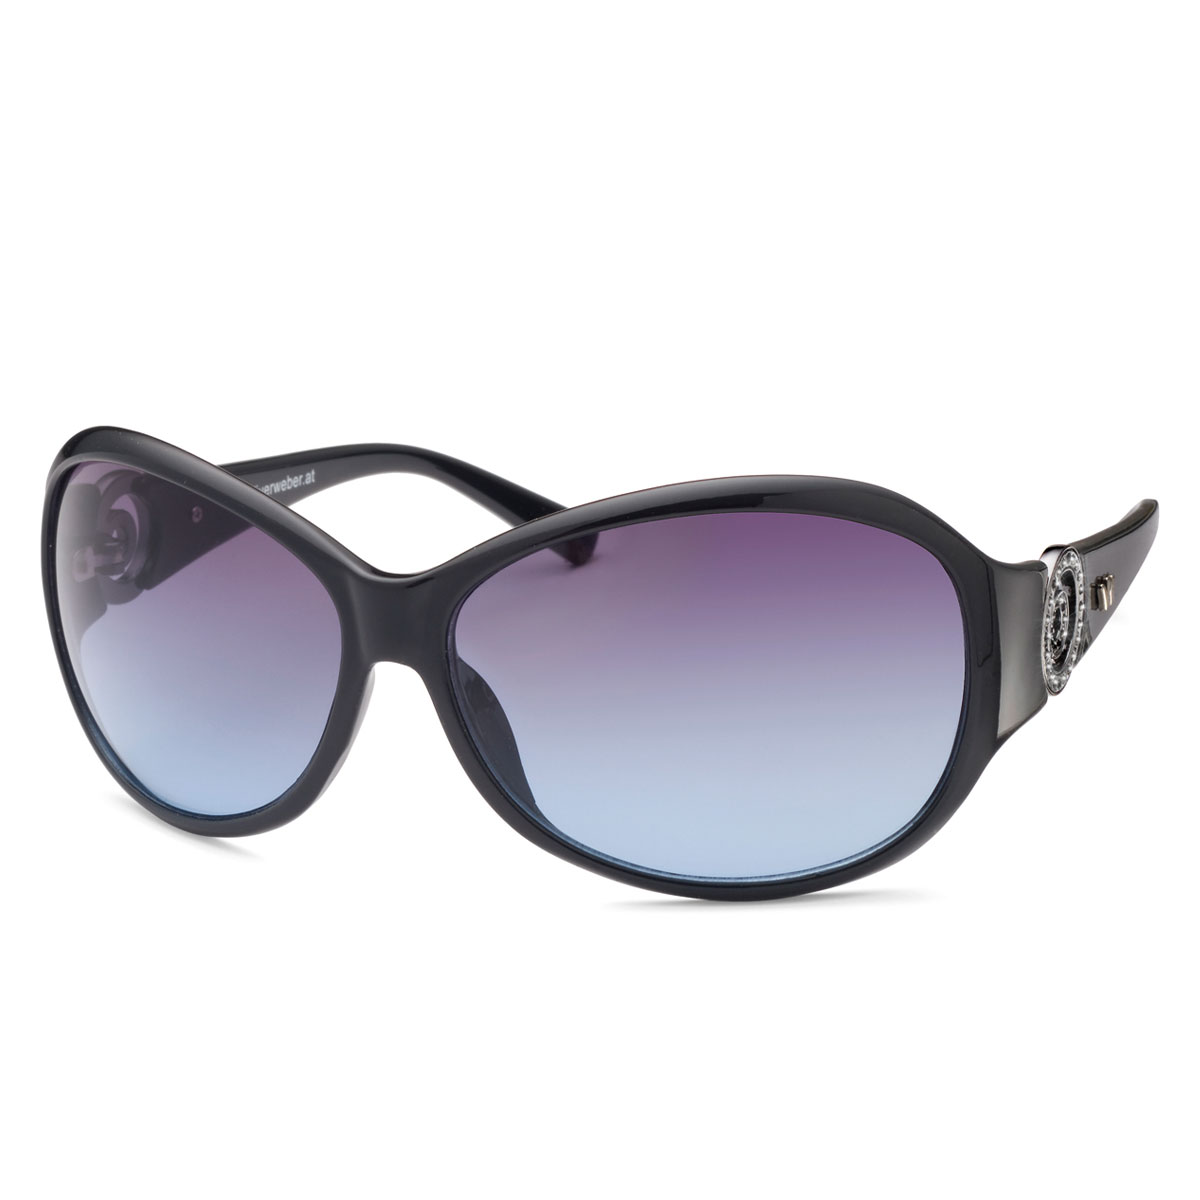 عینک آفتابی مدل کانزاس مشکی